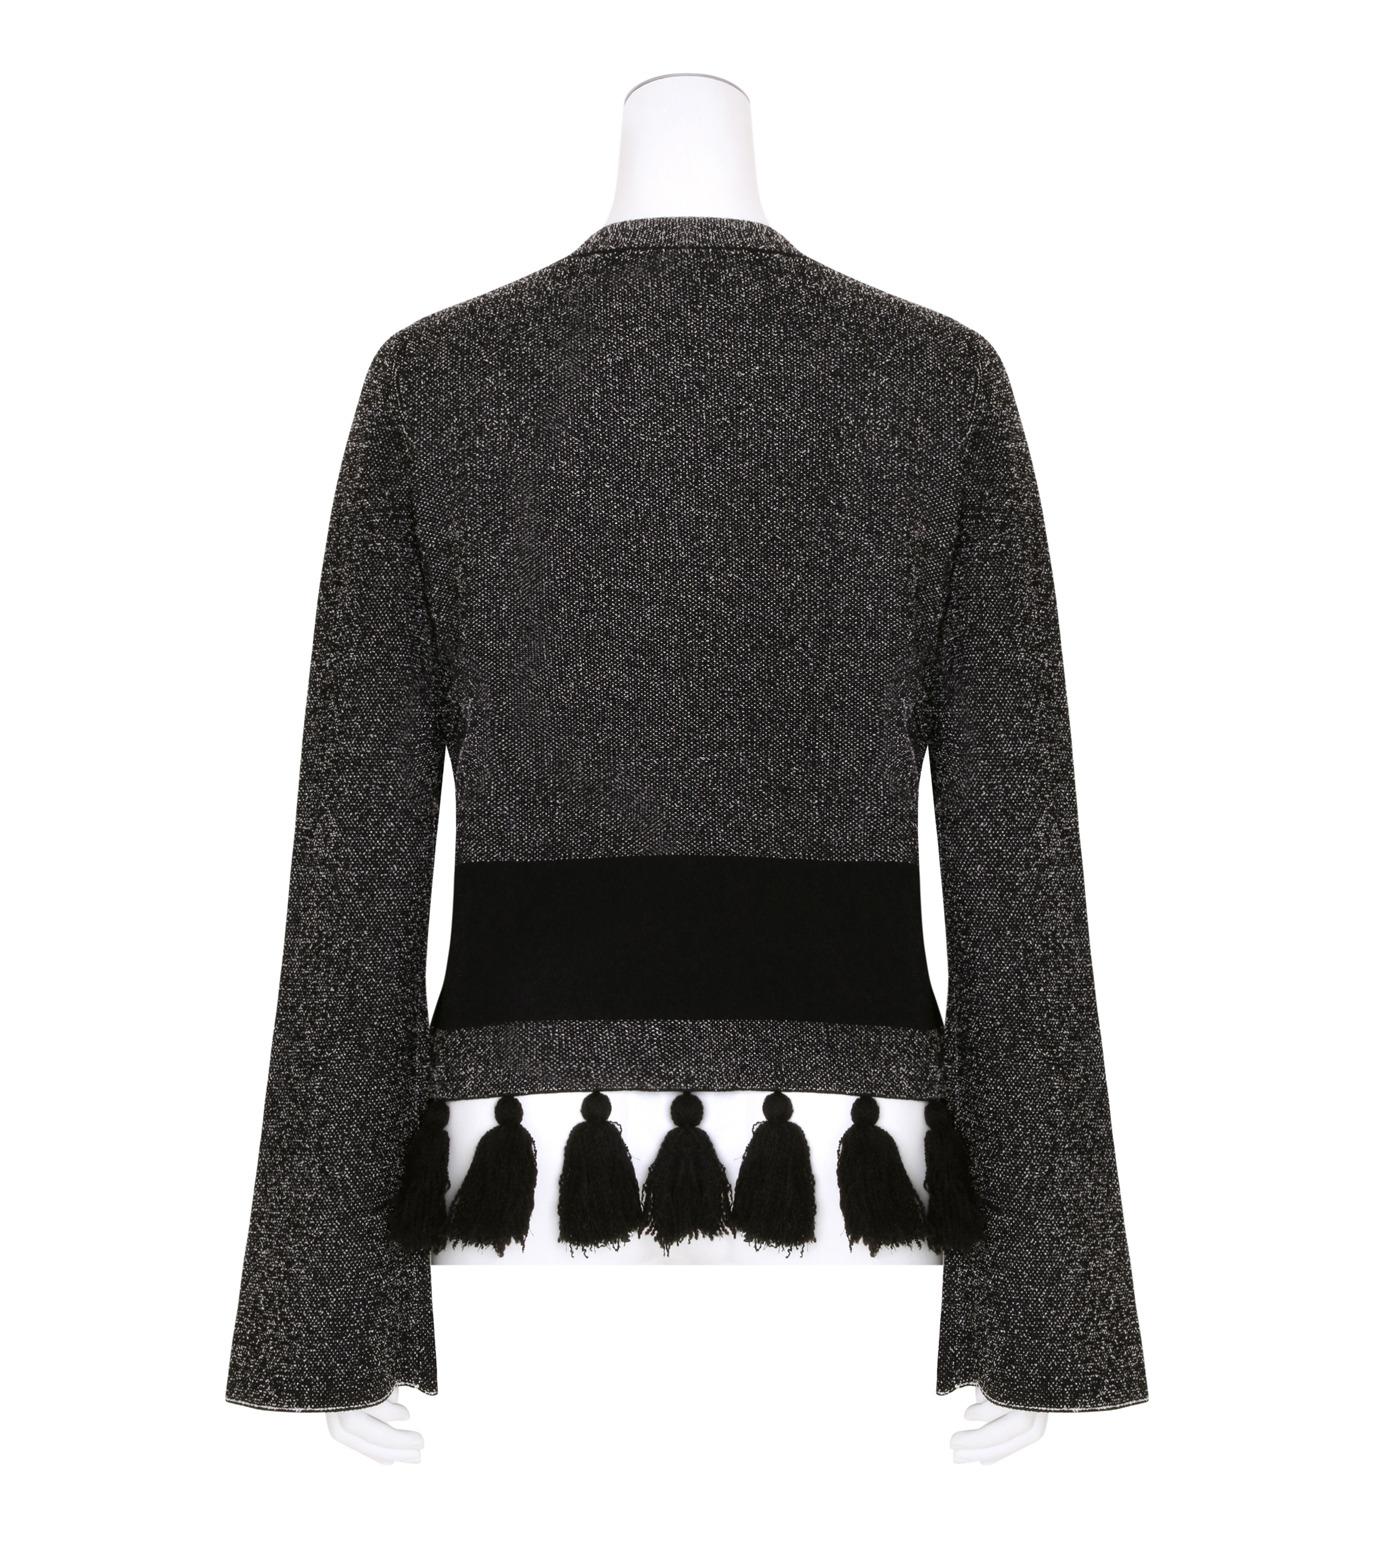 Proenza Schouler(プロエンザ スクーラー)のTweed Knit Flared Slv Crewneck-BLACK(ニット/knit)-R163707-13 拡大詳細画像2